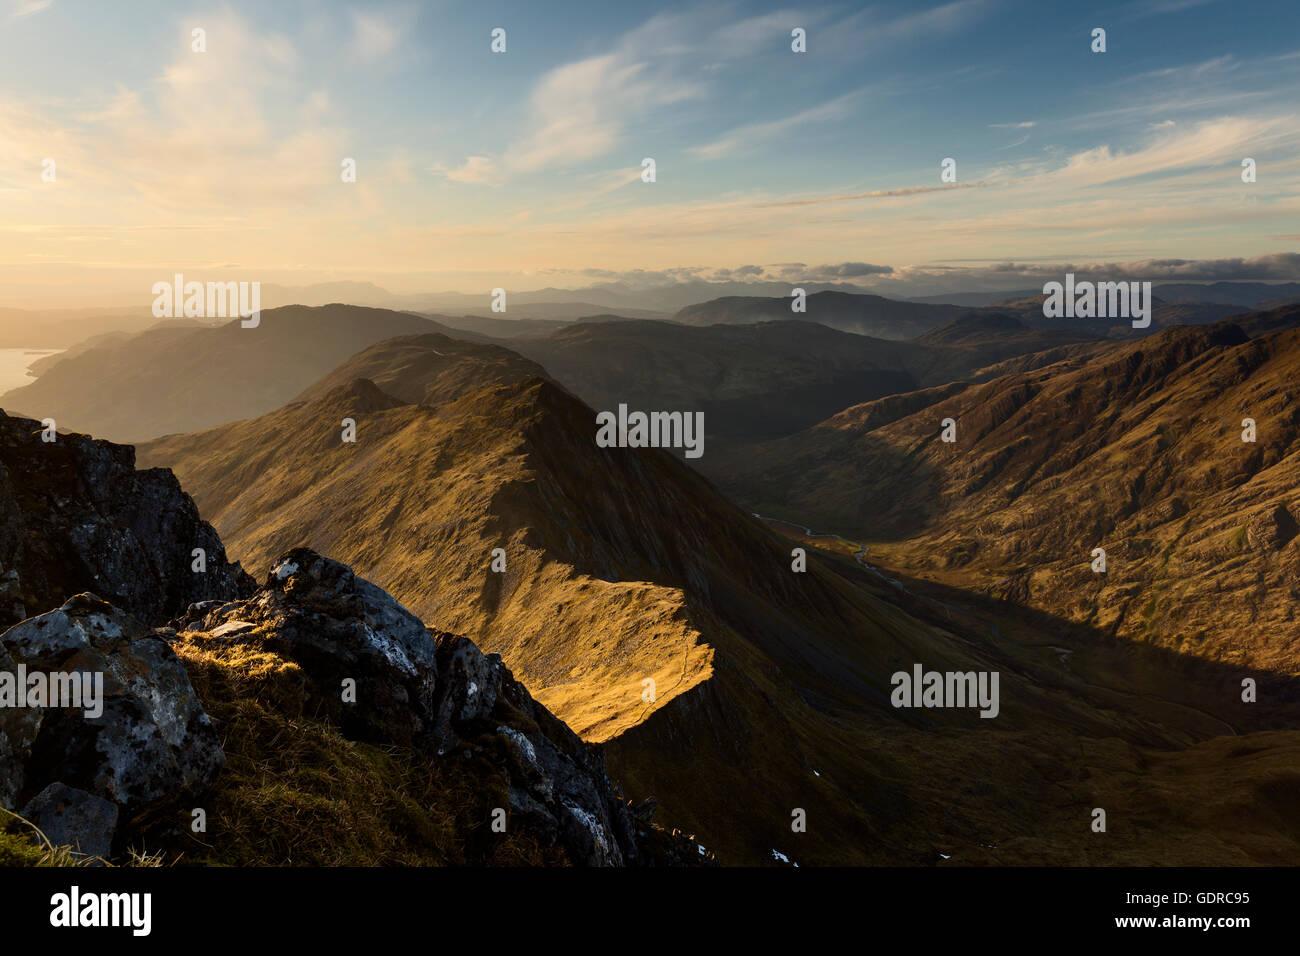 Sgurr nan Saighead sidelit by the setting sun (Five Sisters of Kintail) - Stock Image